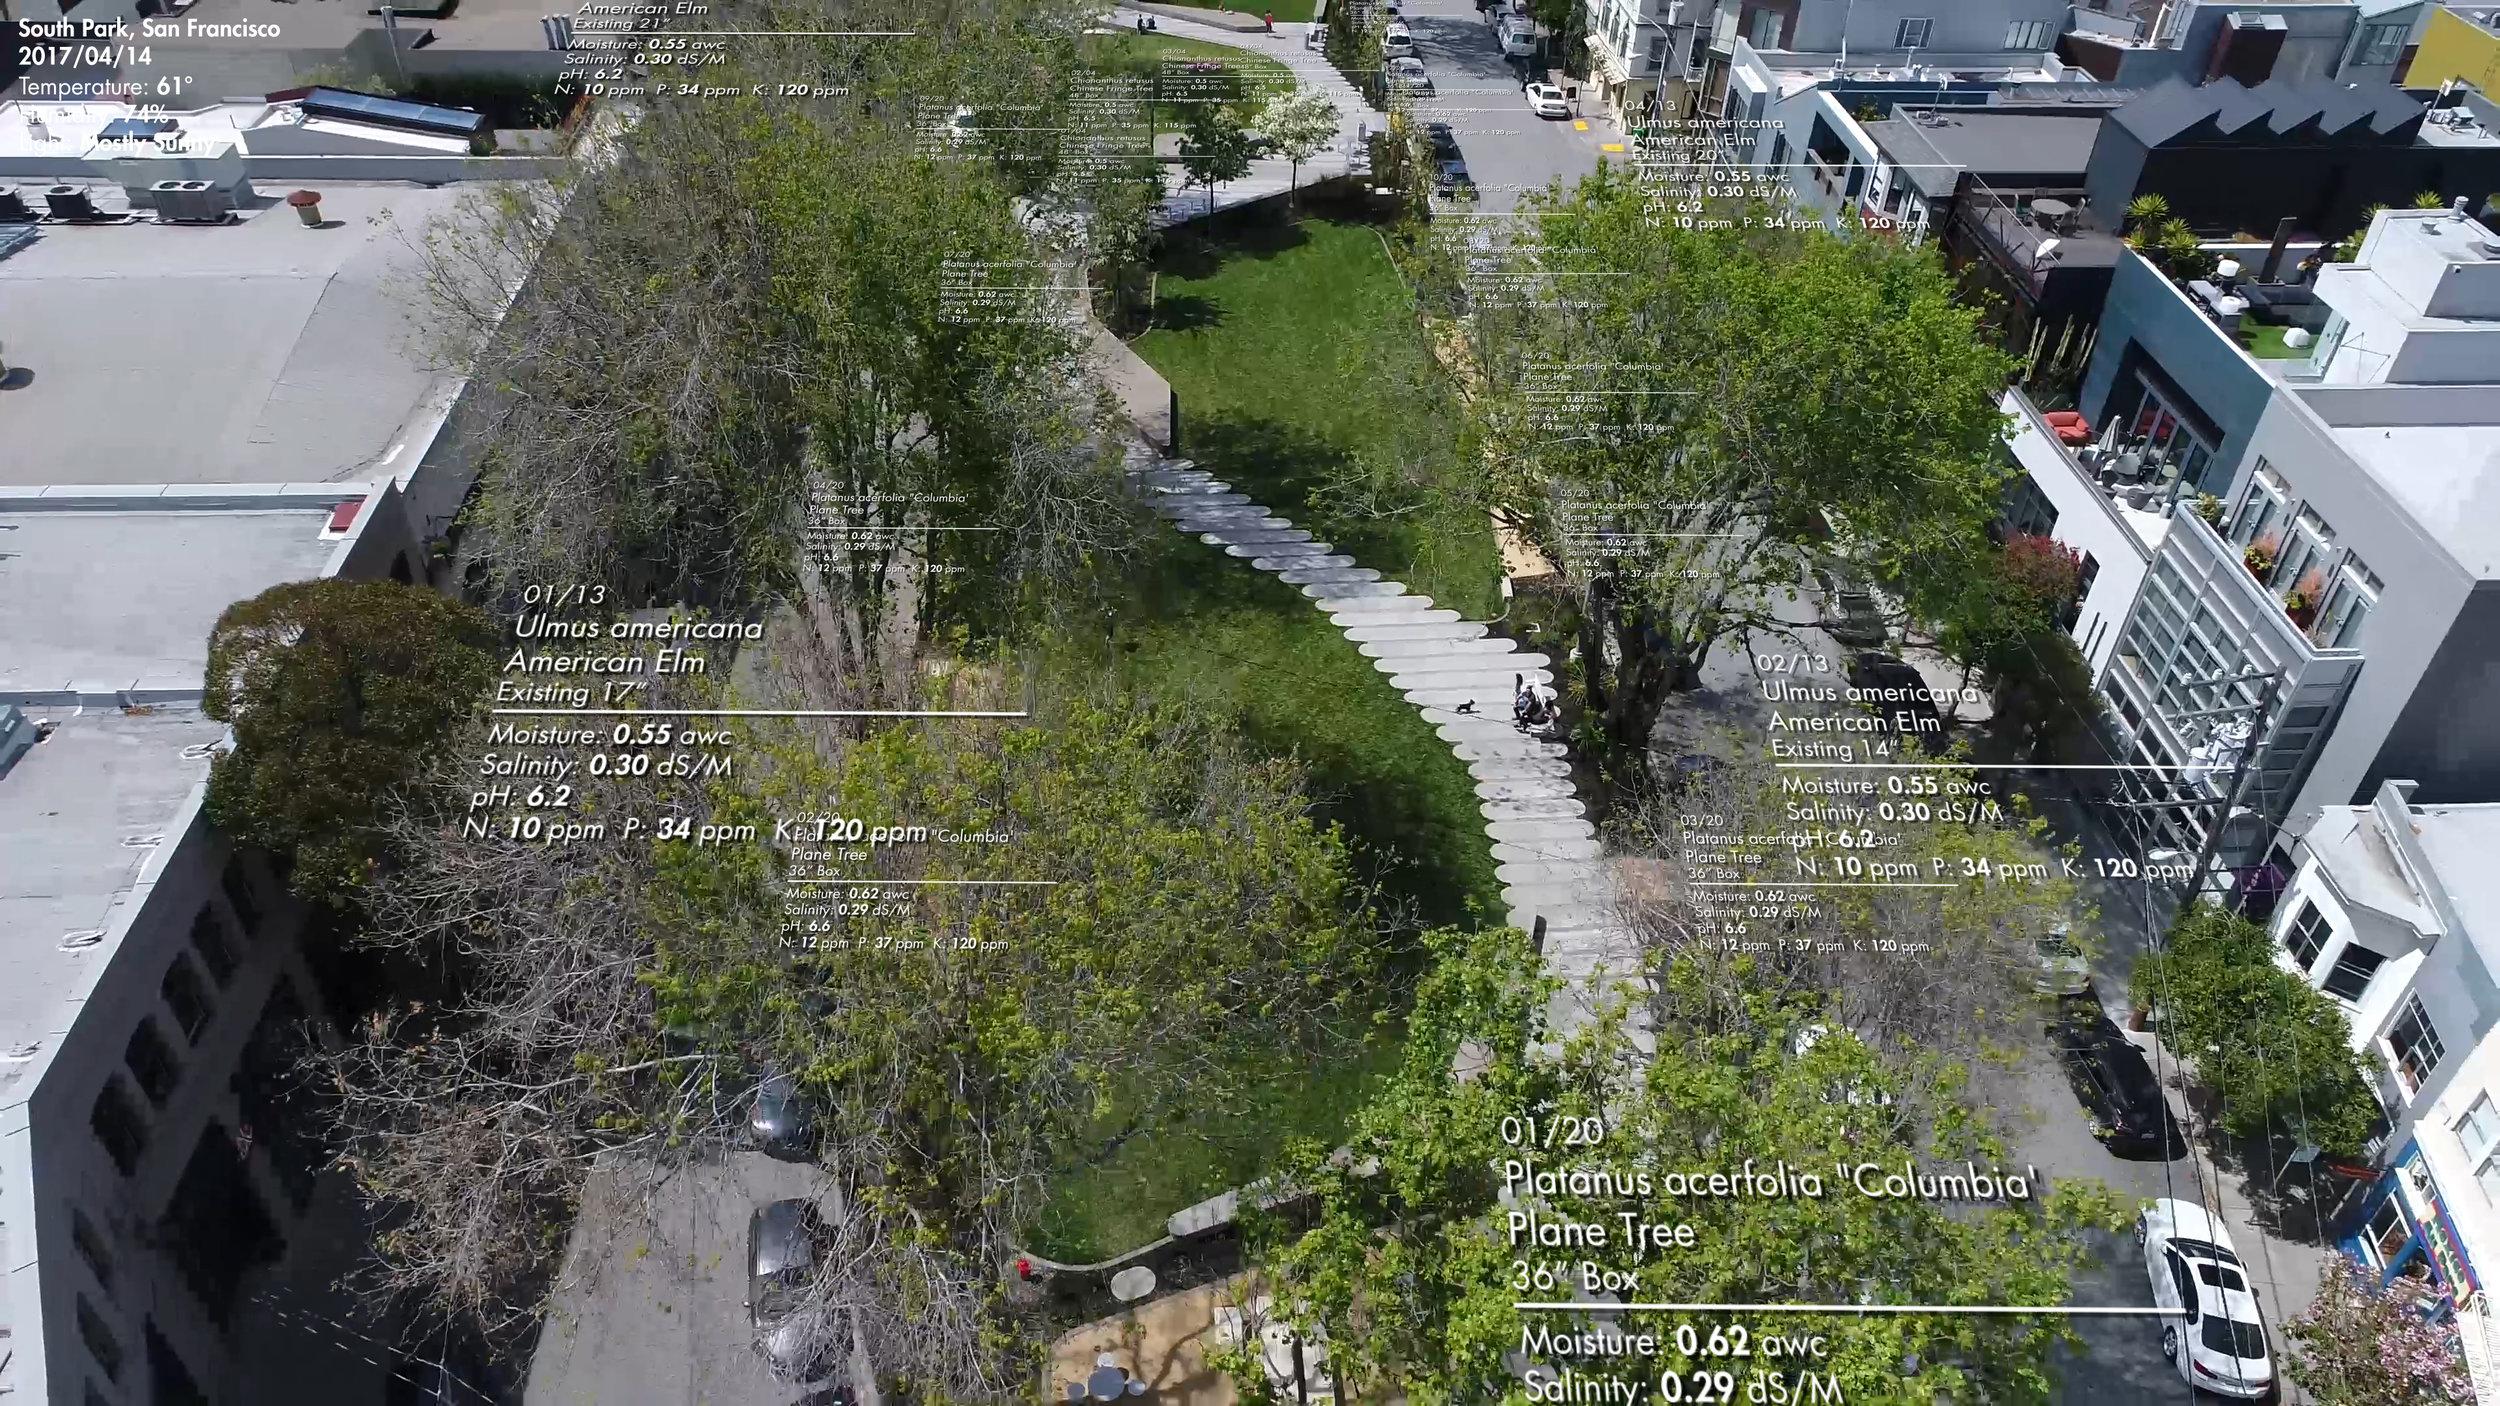 Mock-up for Visualizing Environmental Data at South Park. Image by Luke Hegeman